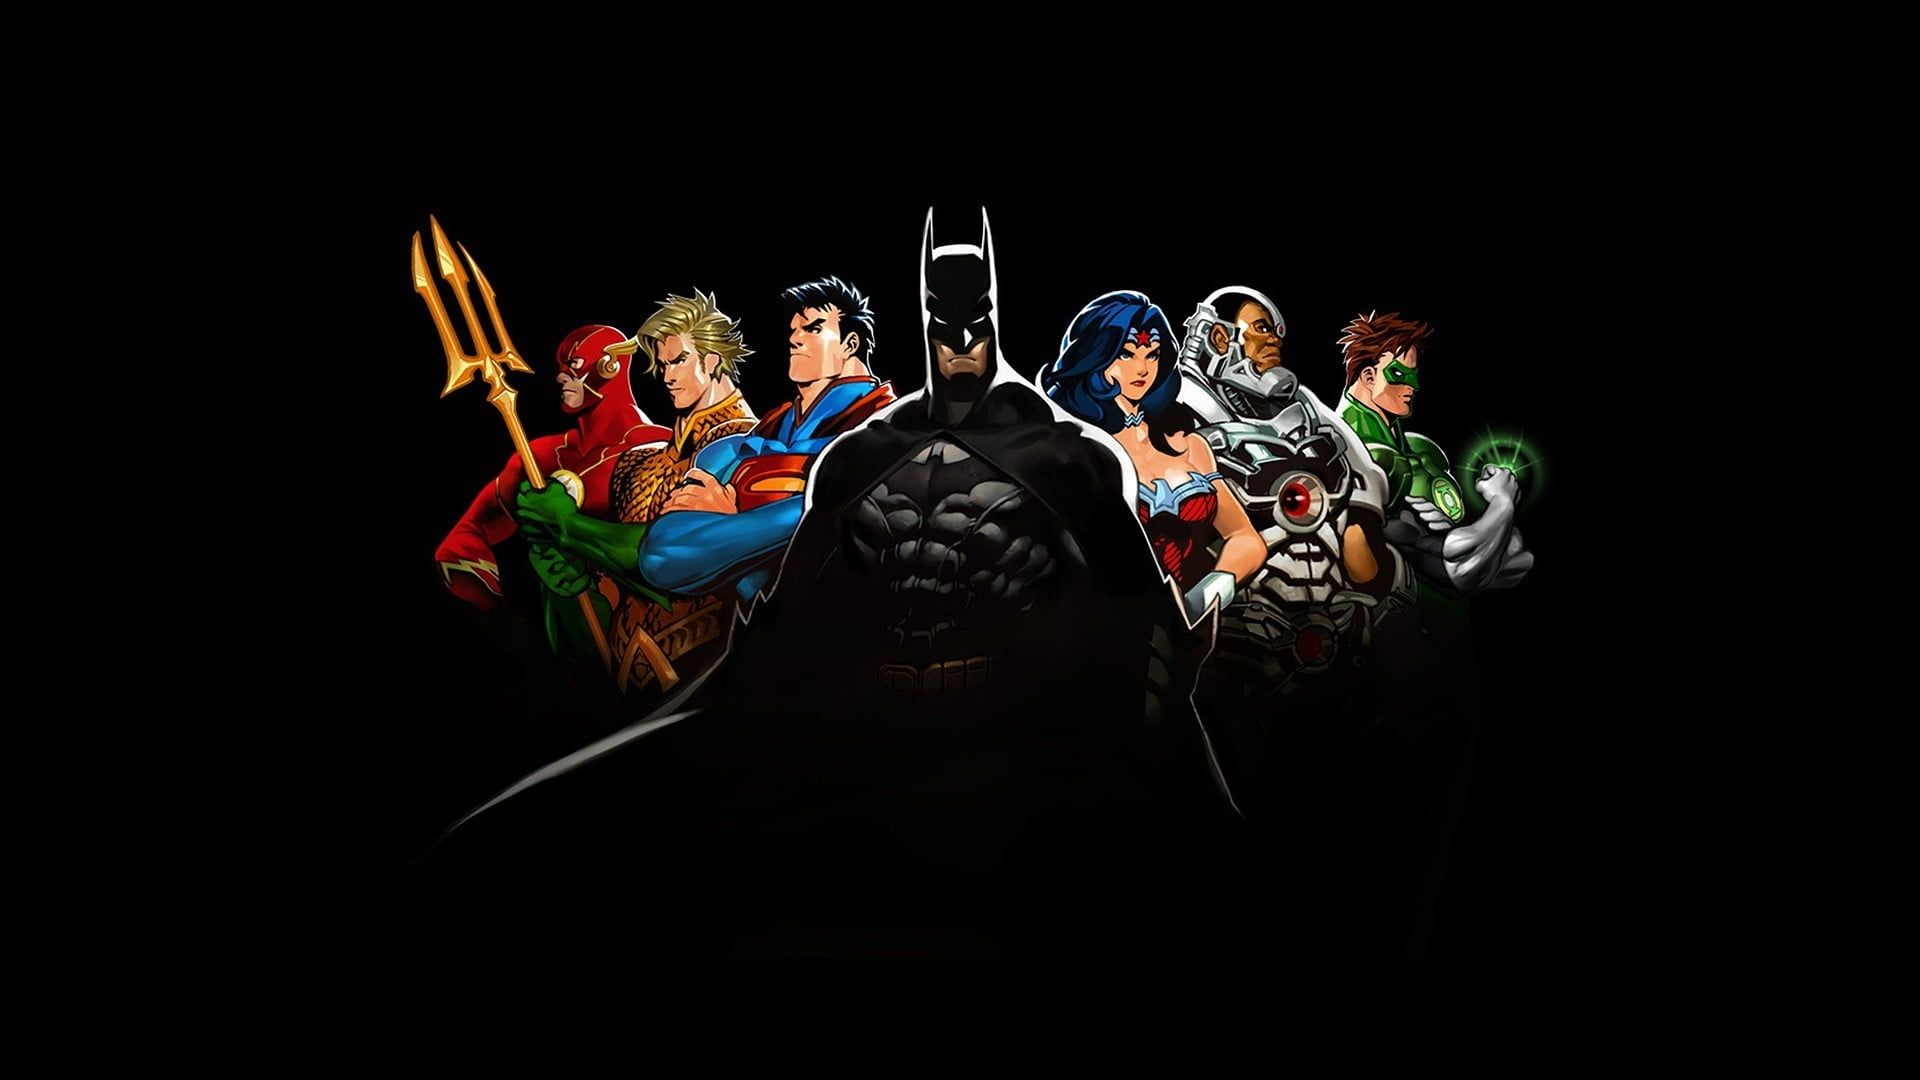 Justine League Digital Wallpaper Justice League 3d Wallpaper Comics Dc Comics Justice League The In 2020 Dc Comics Wallpaper Cyborg Dc Comics Justice League Aquaman